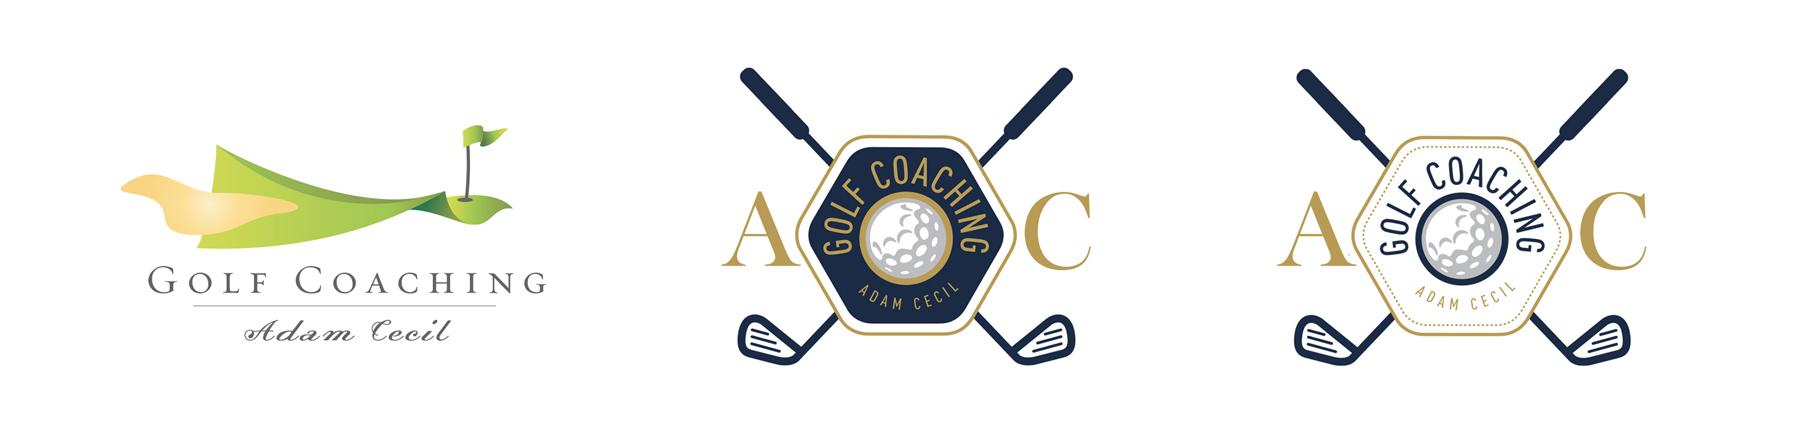 Adam Cecil Golf Coaching Logo Banner